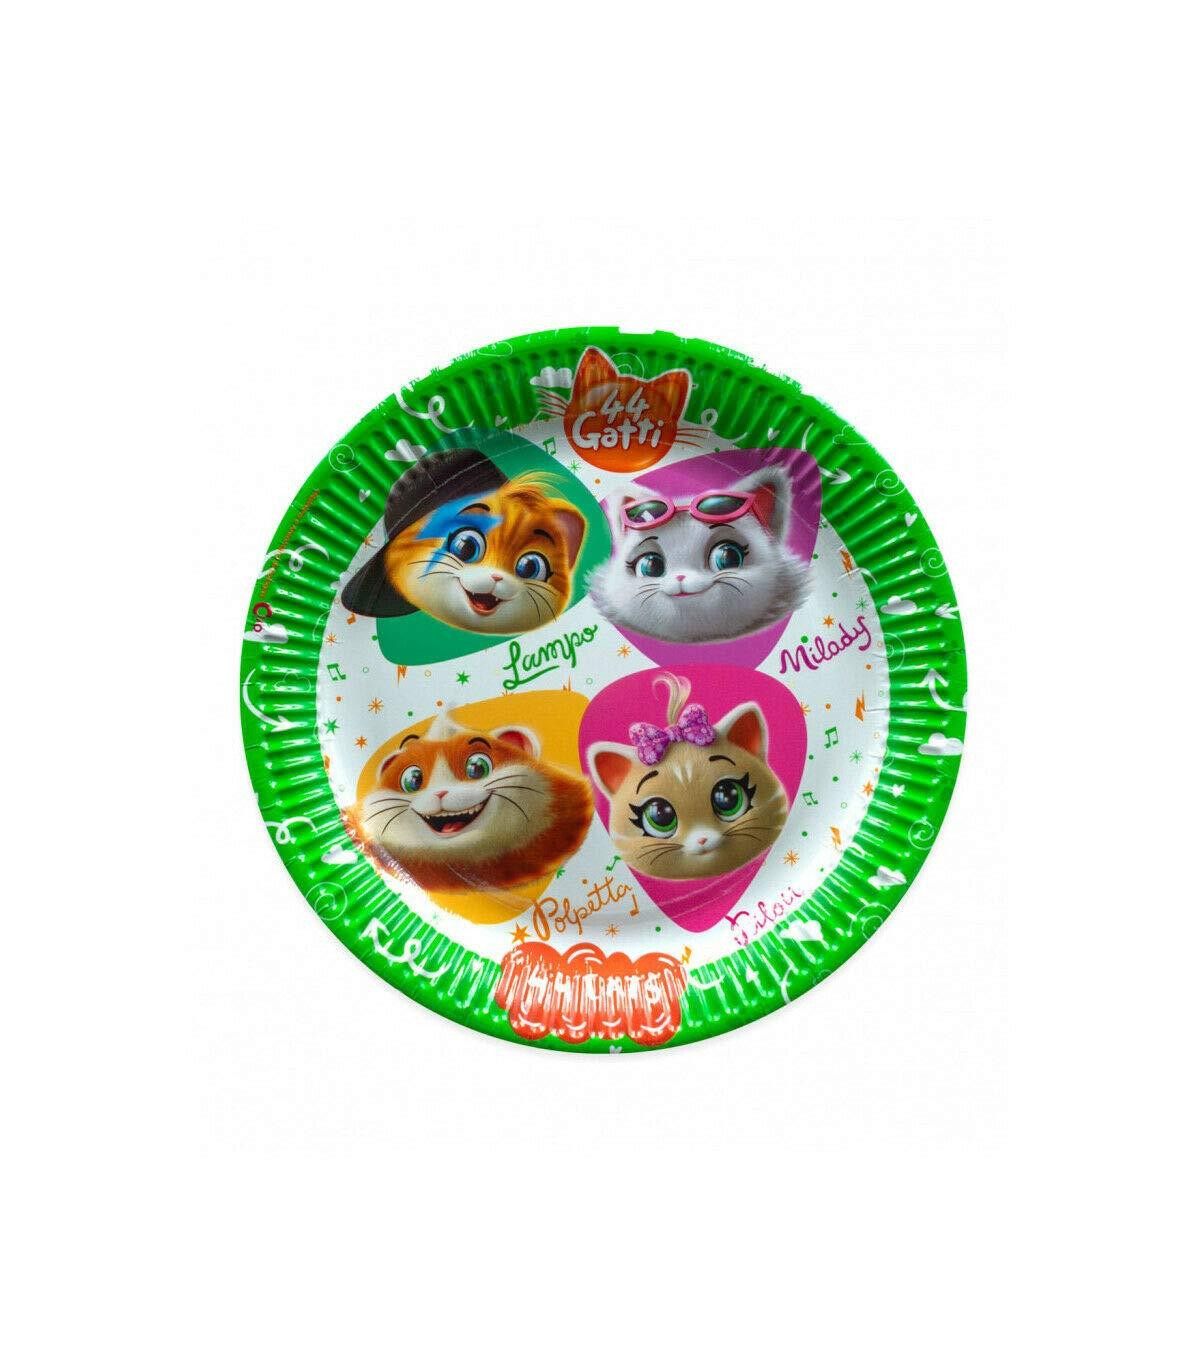 Irpot Kit n.49 F Festa Compleanno 44 Gatti